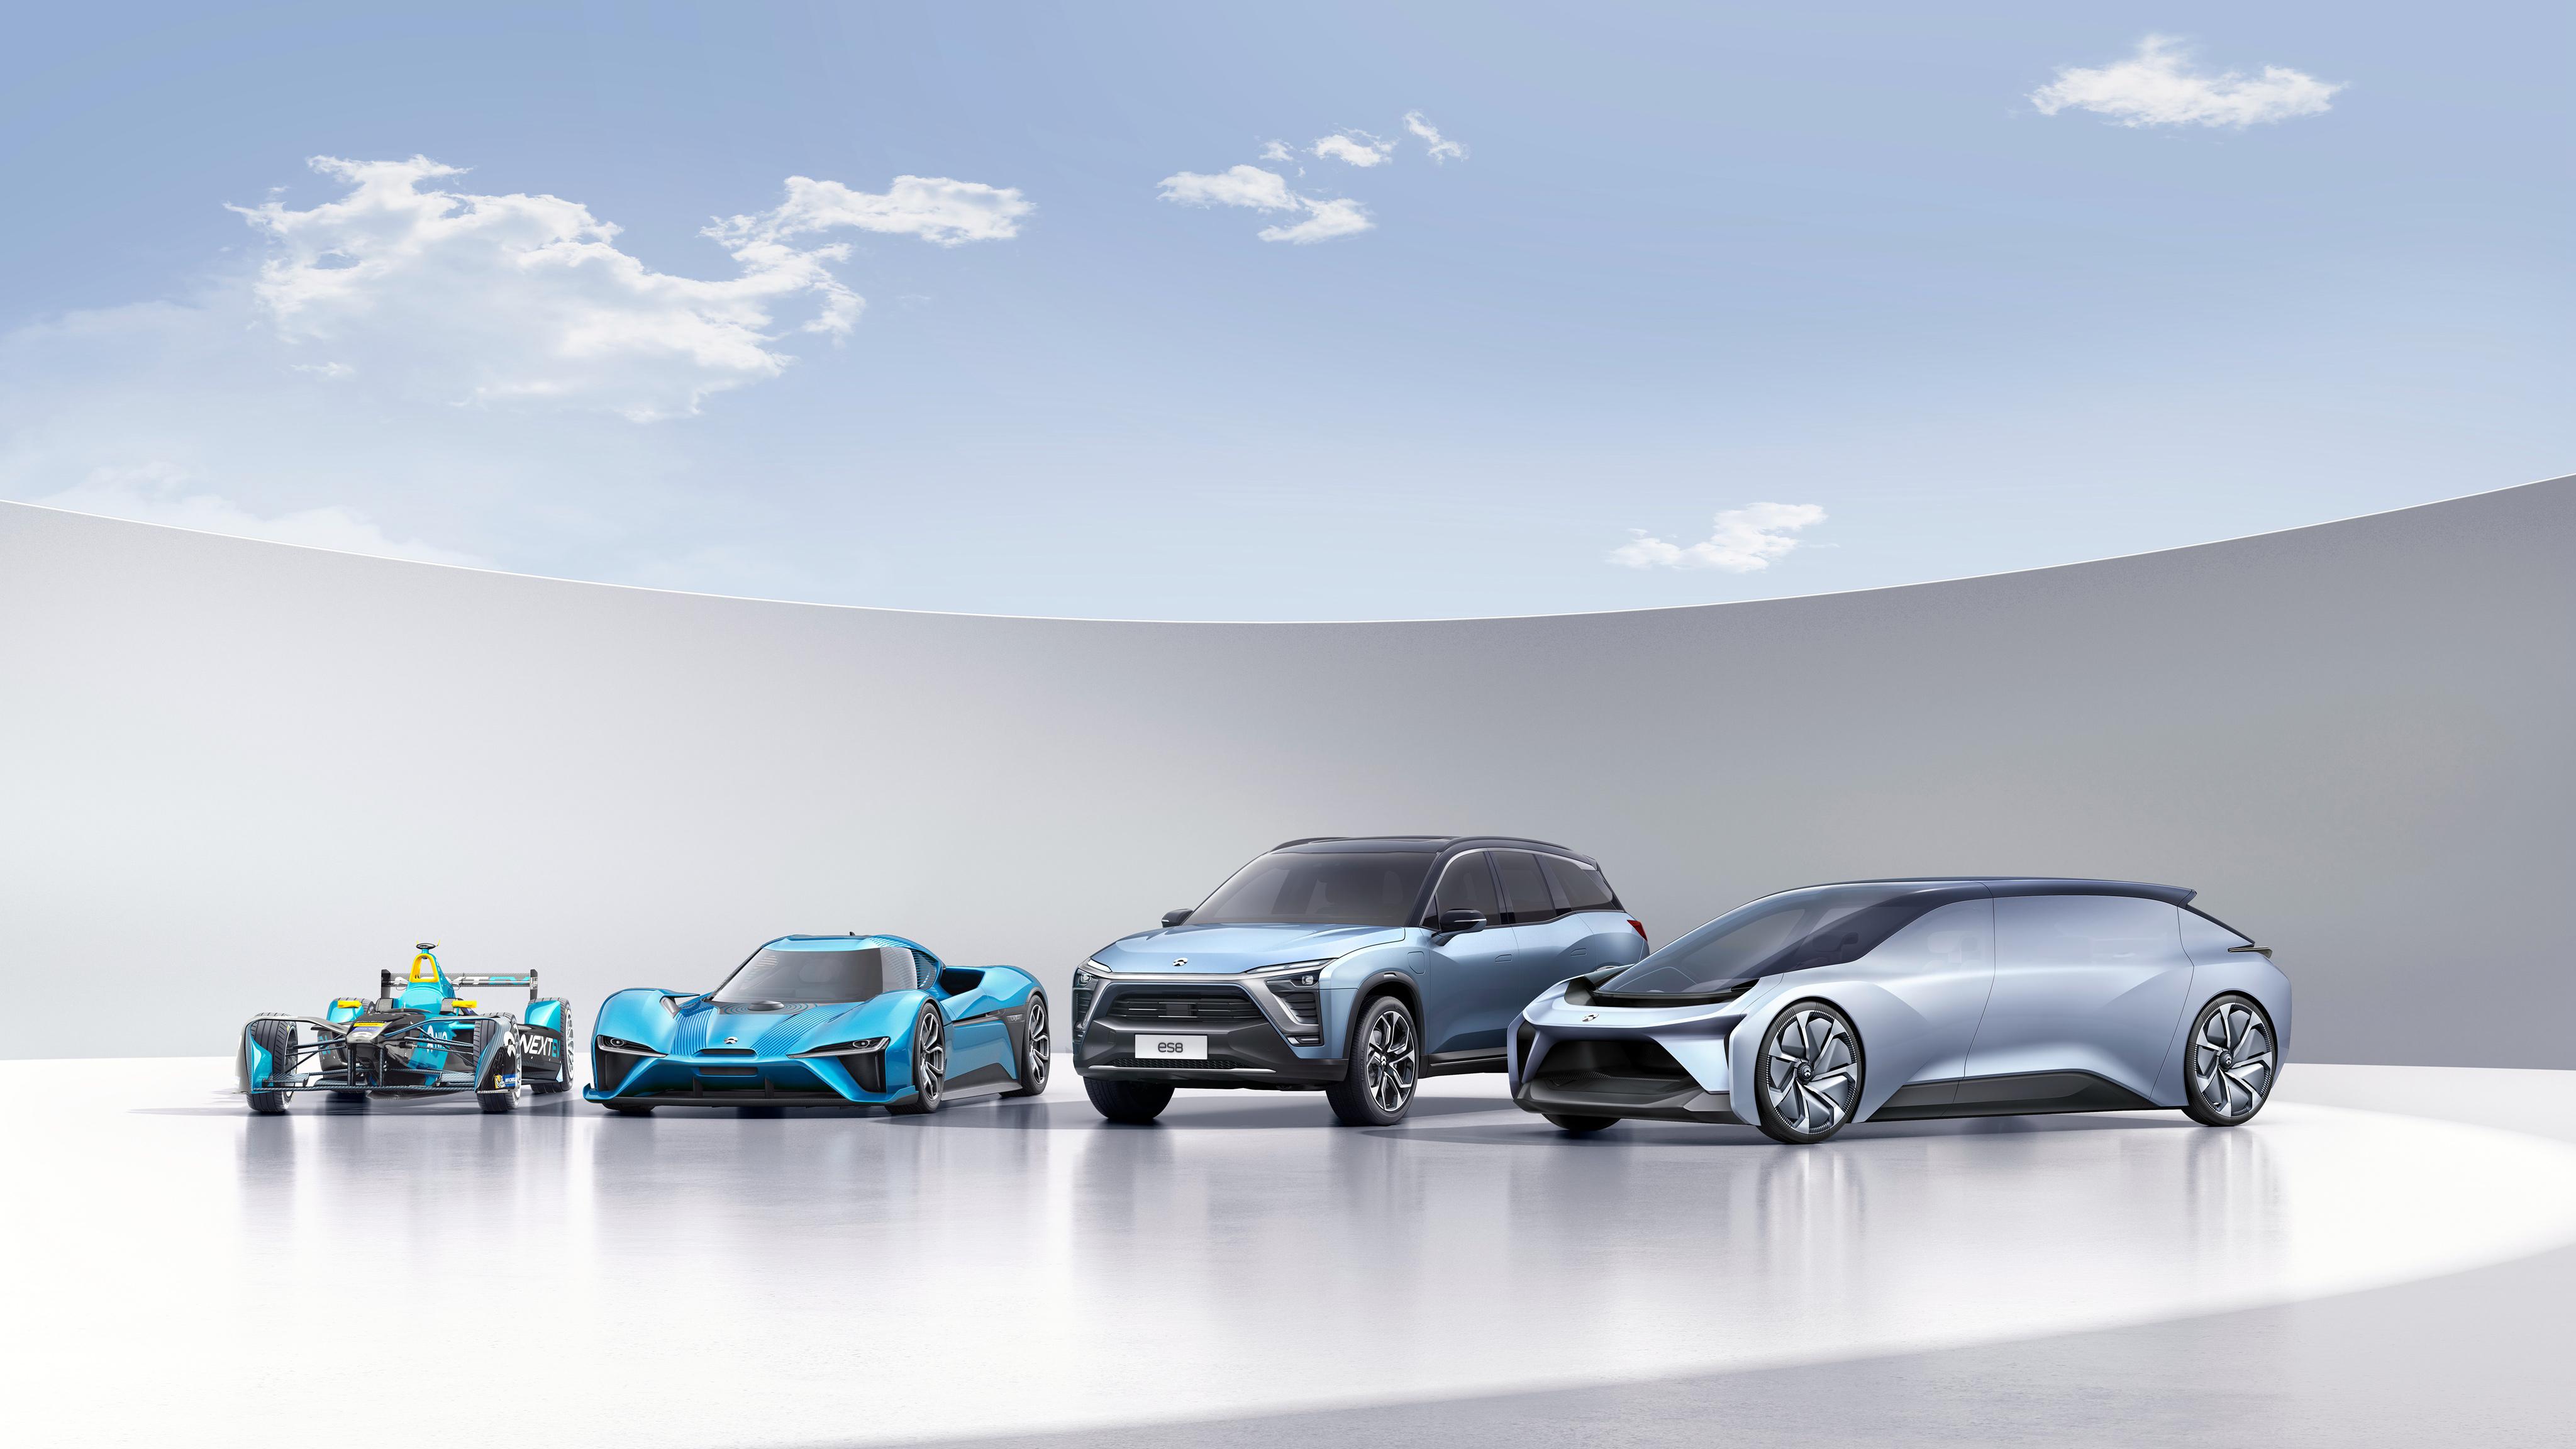 NextEV NIO Electric Cars 4K Wallpaper